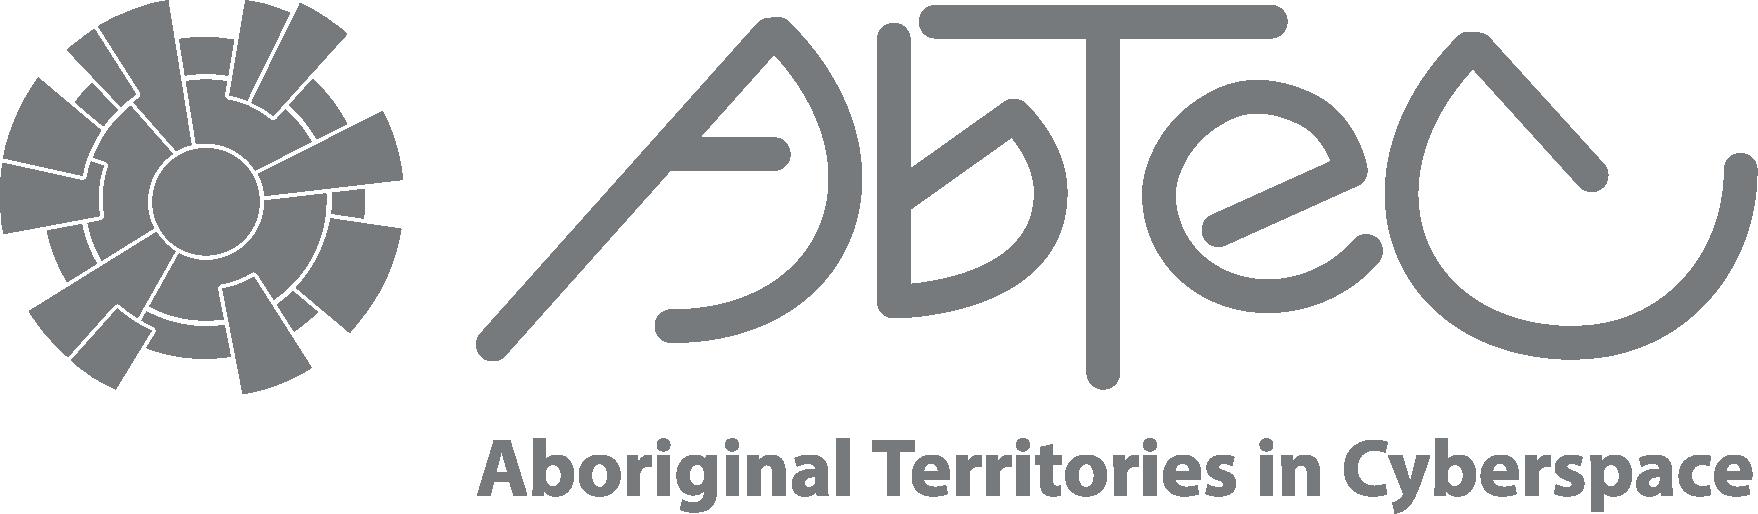 Abteclogo_icon_logo_type_b_gris